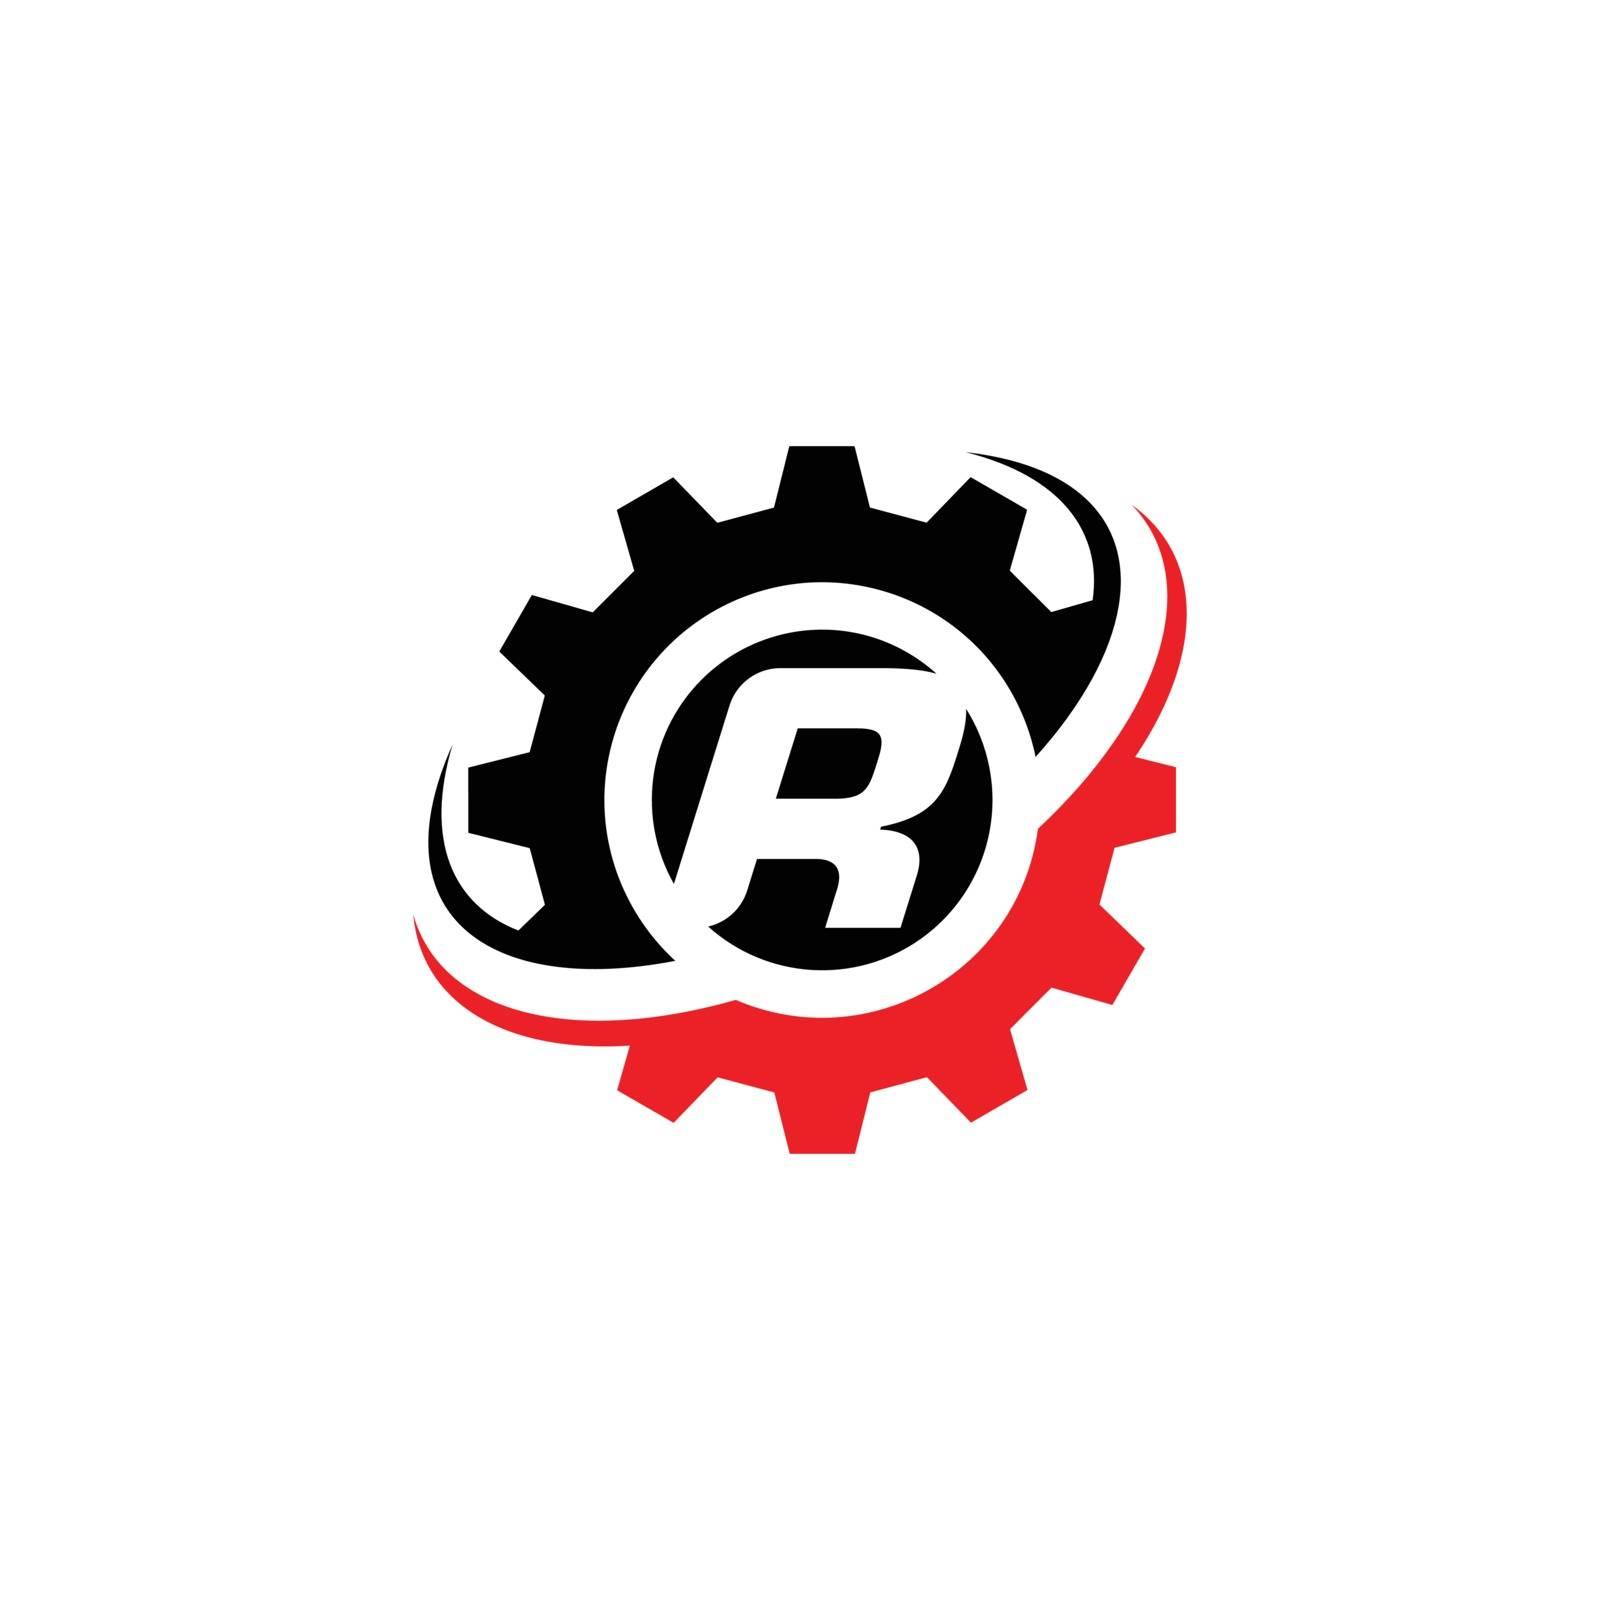 Letter R Gear Logo Design Template